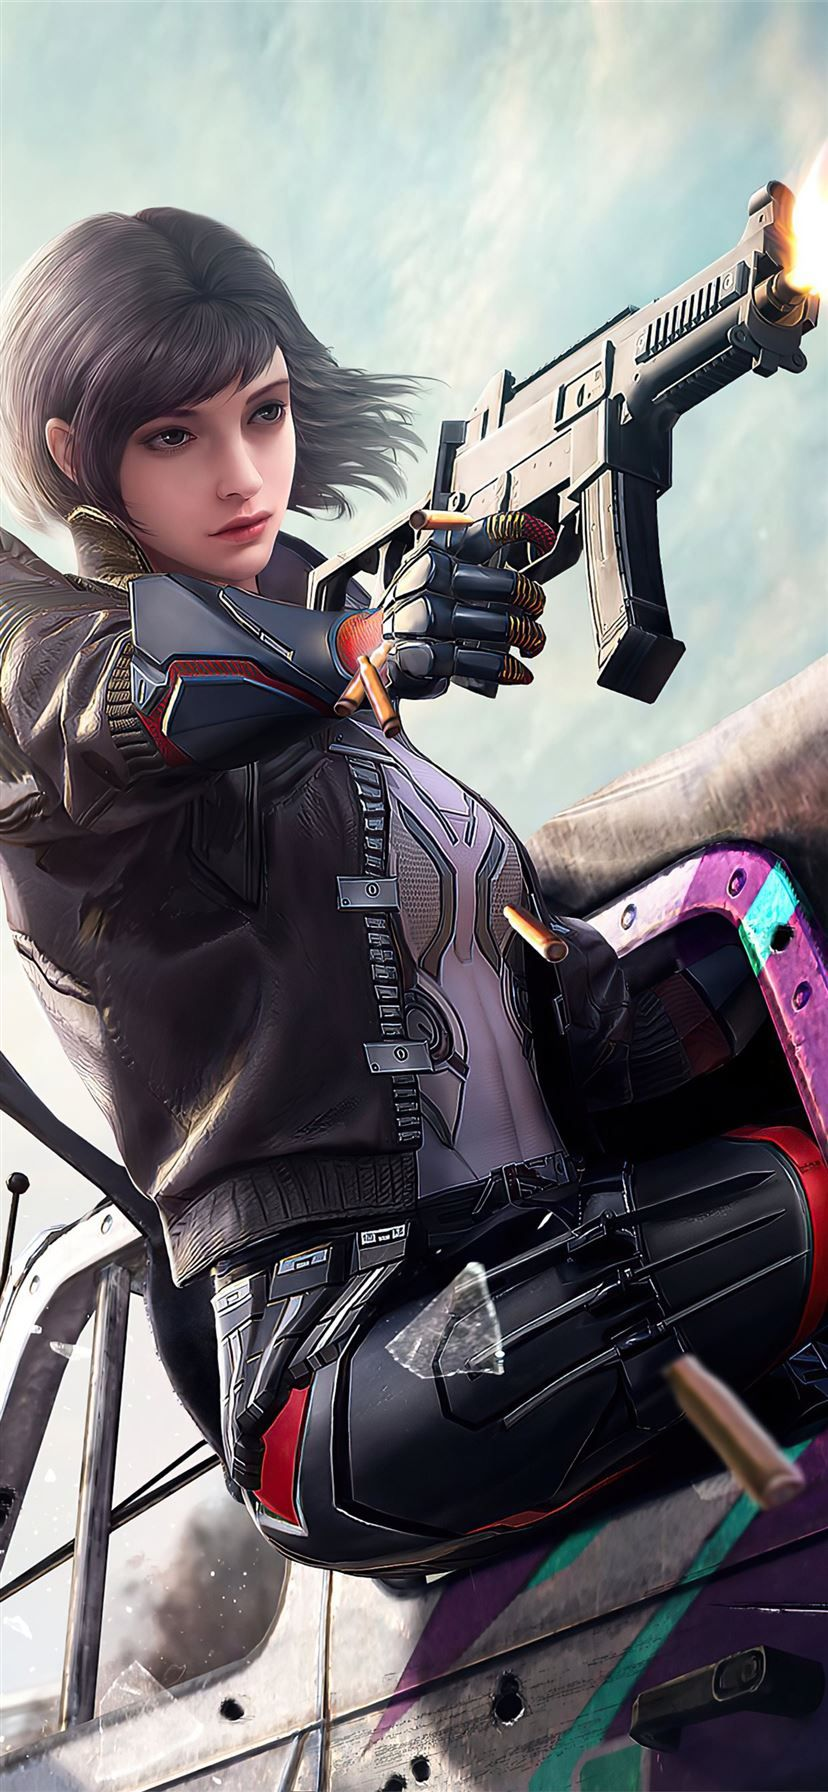 2020 pubg girl 4k game iPhone 11 ...